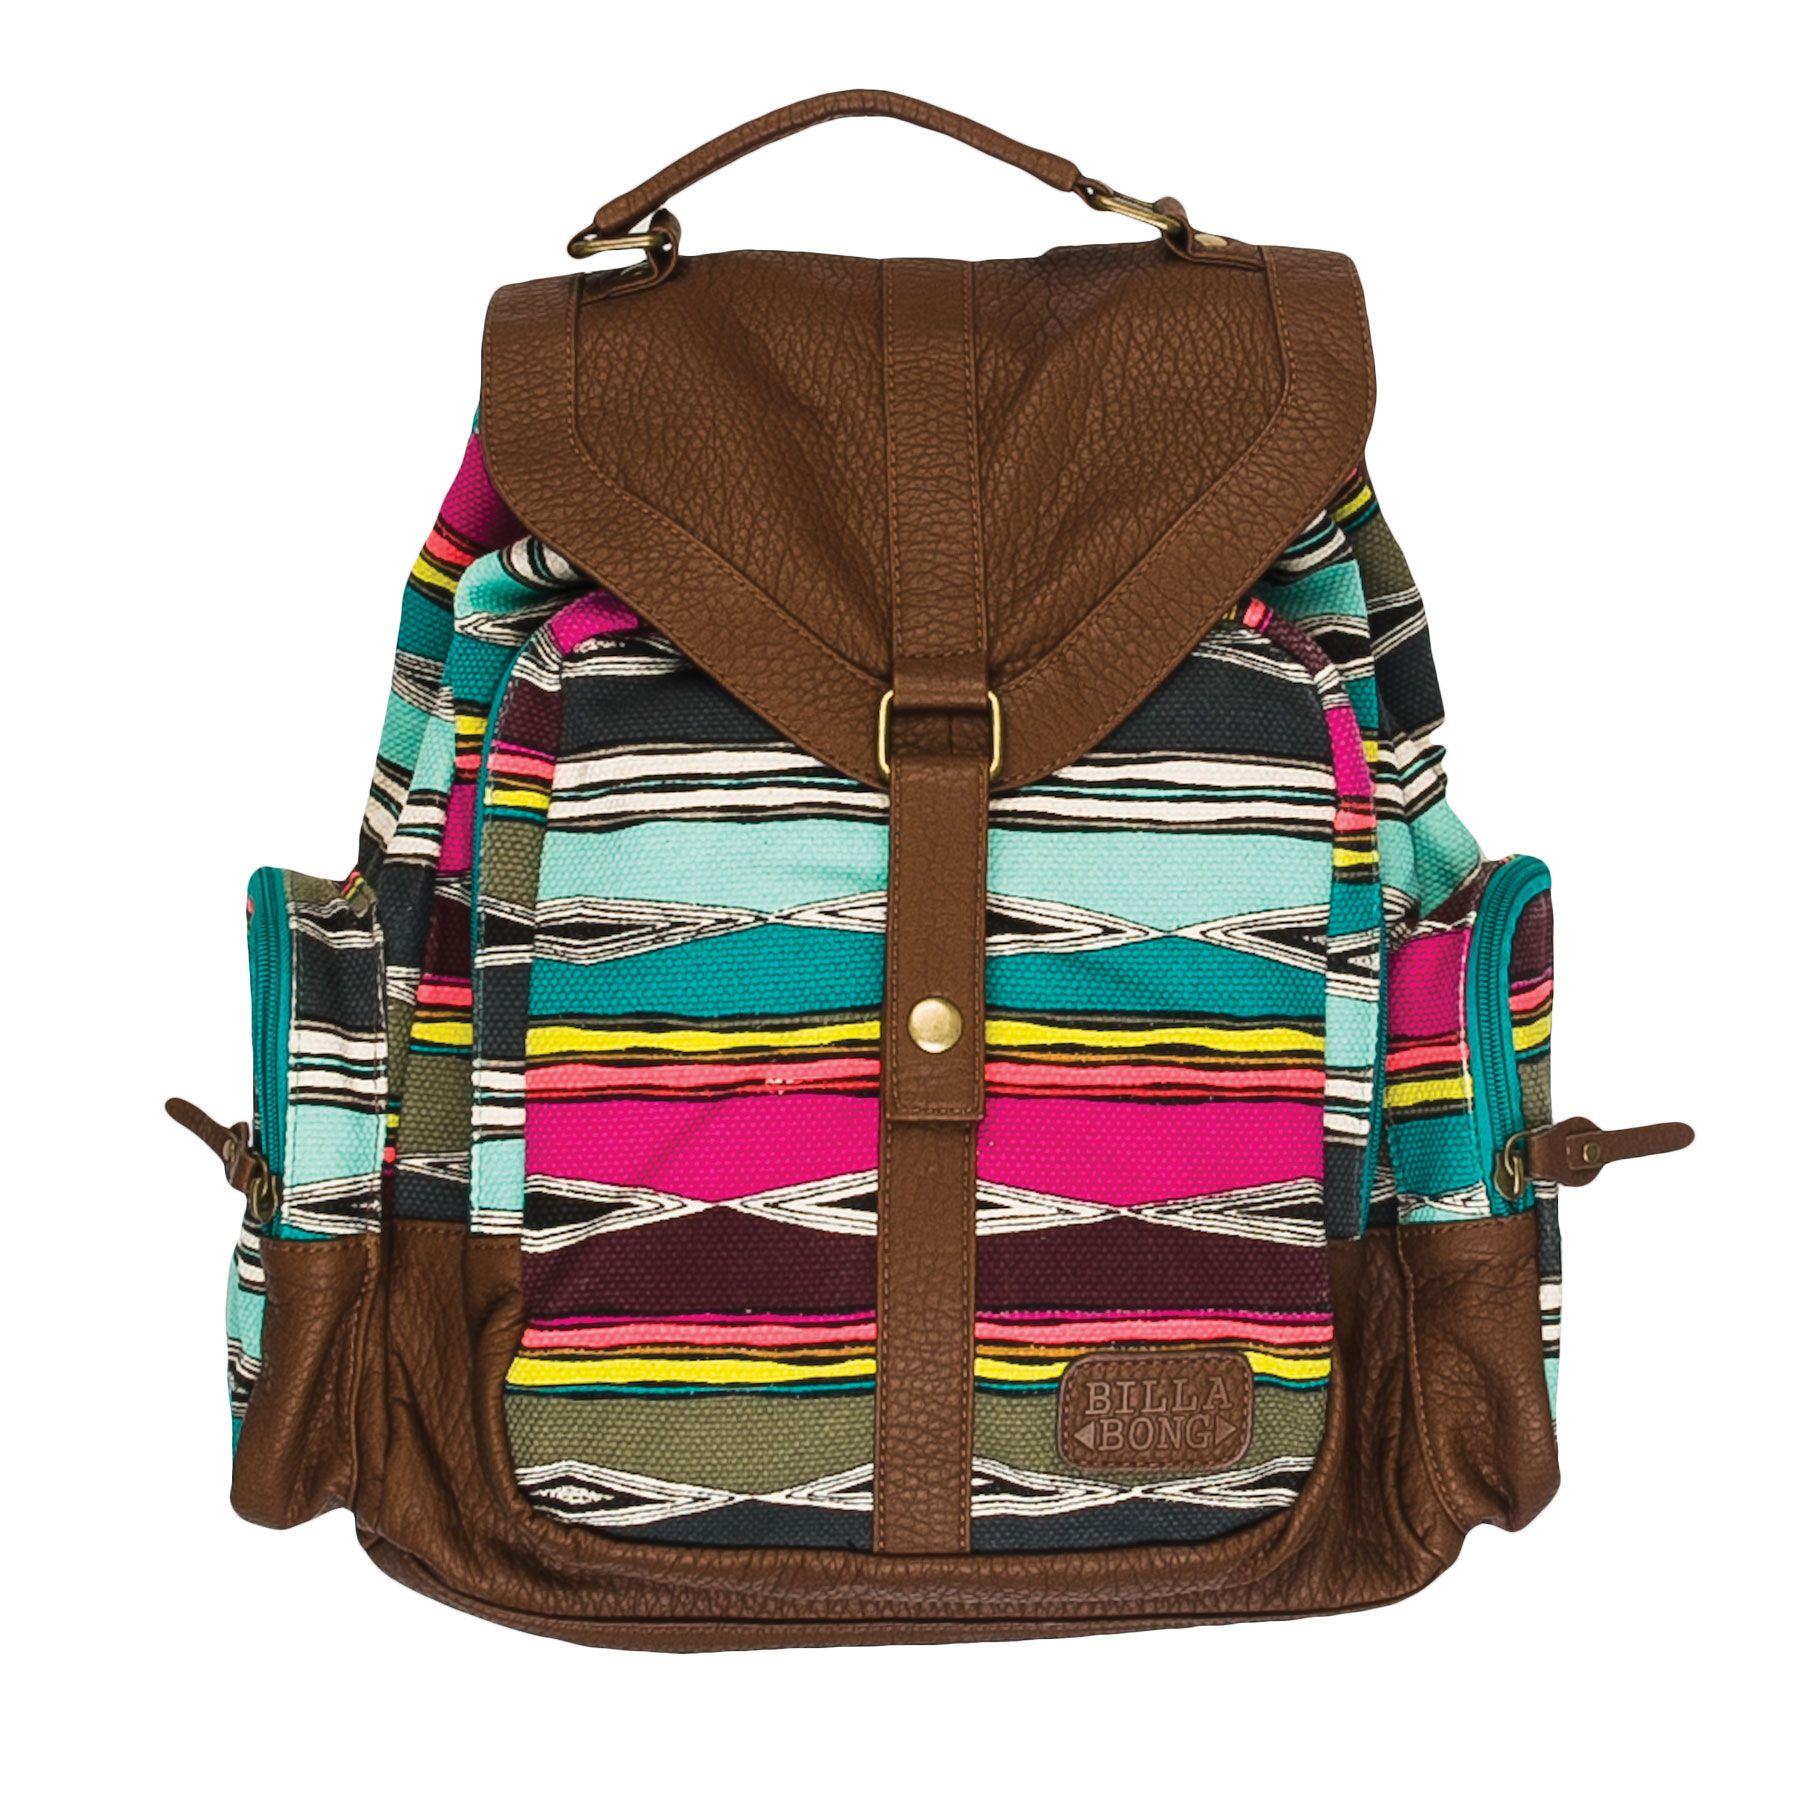 Alice Backpack Dayz campfire dayz backpack | fashion, backpacks, backpack bags